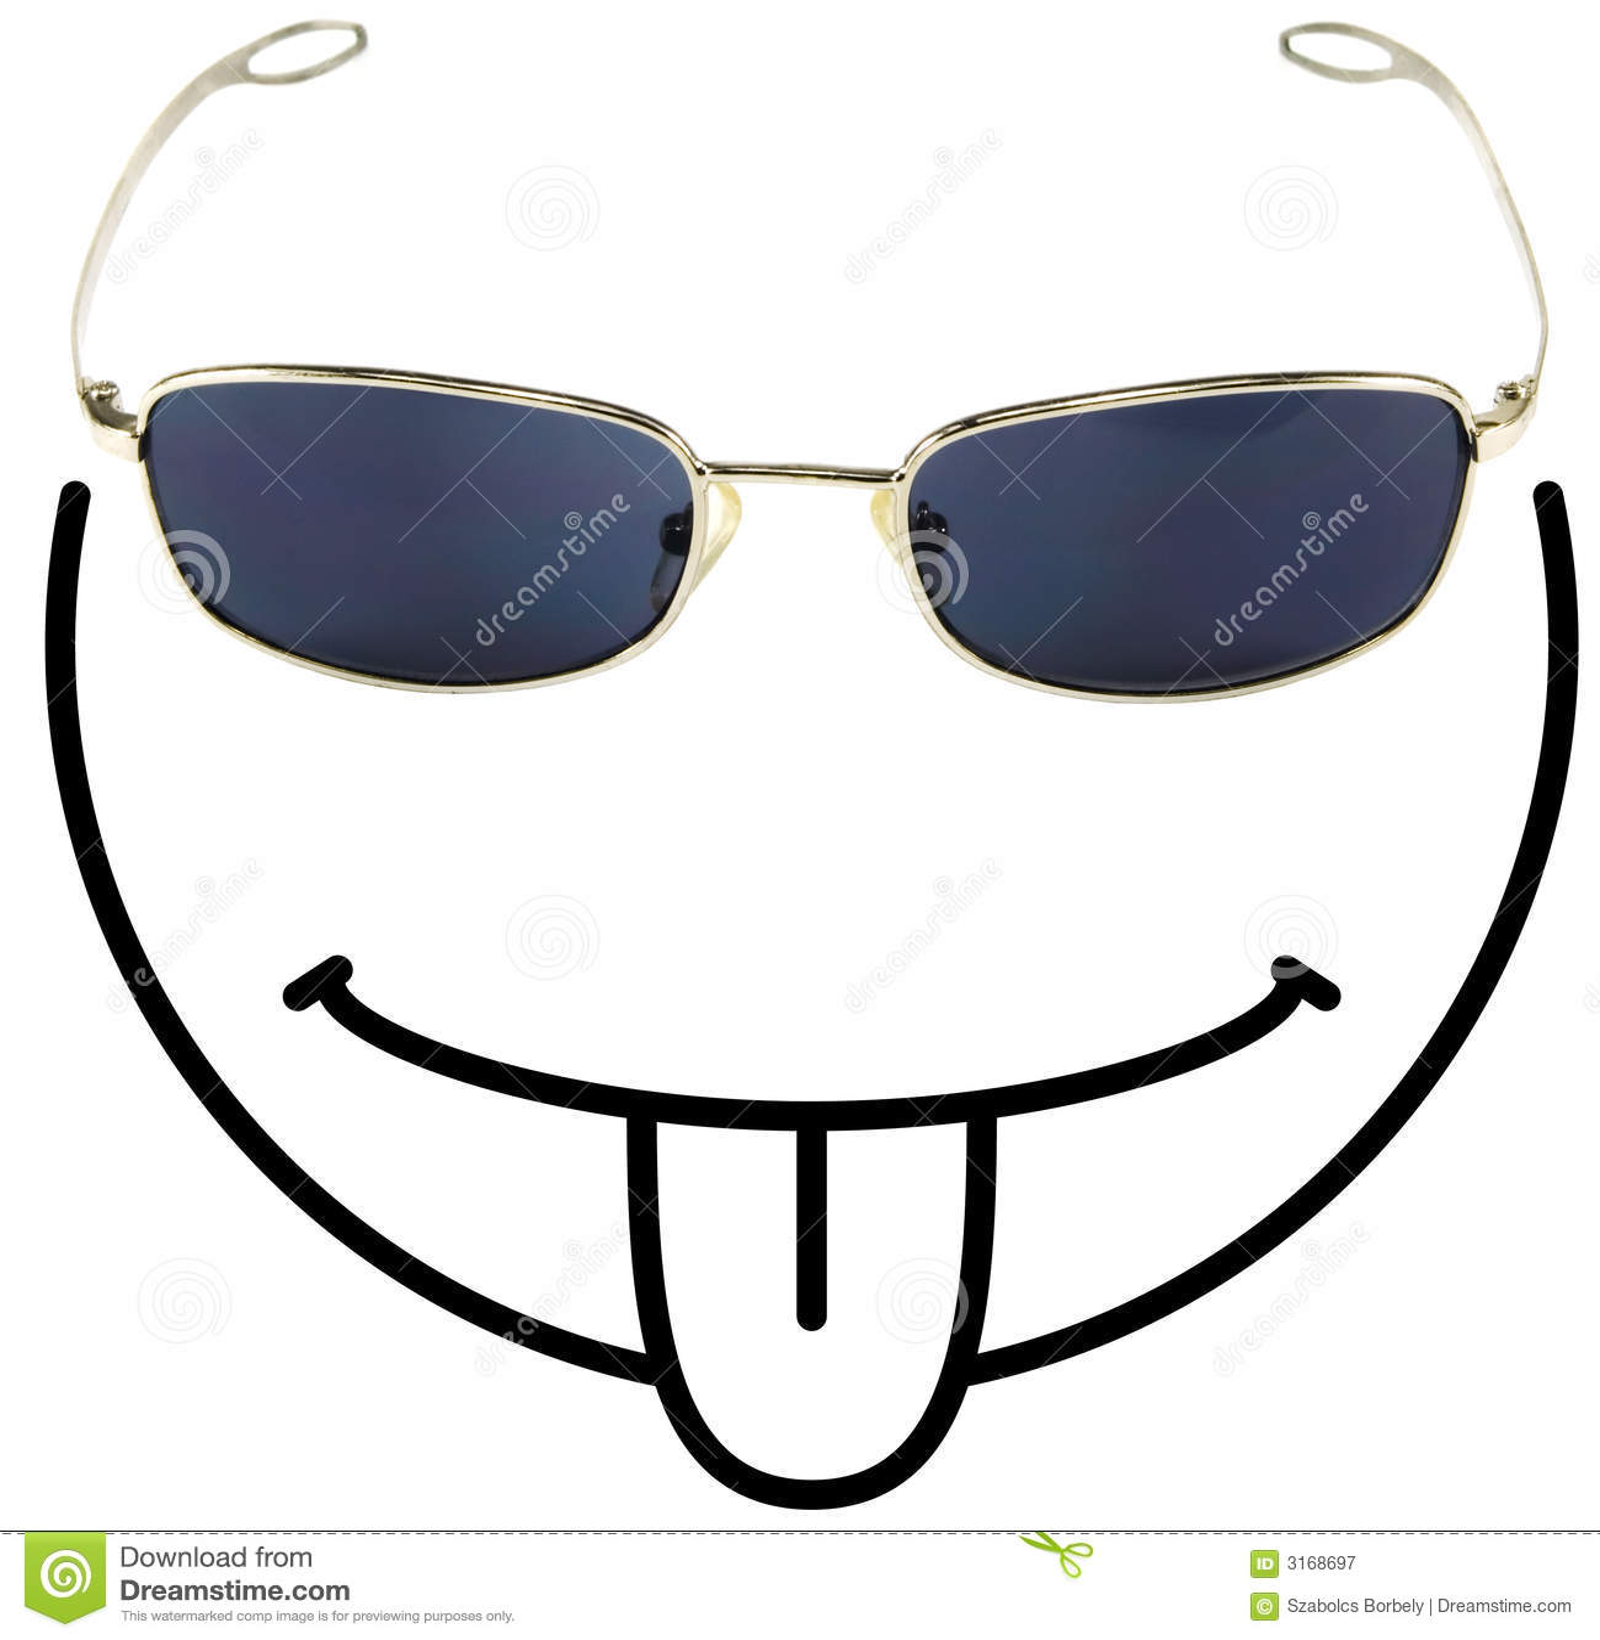 Grappige tong-plakkende smiley F